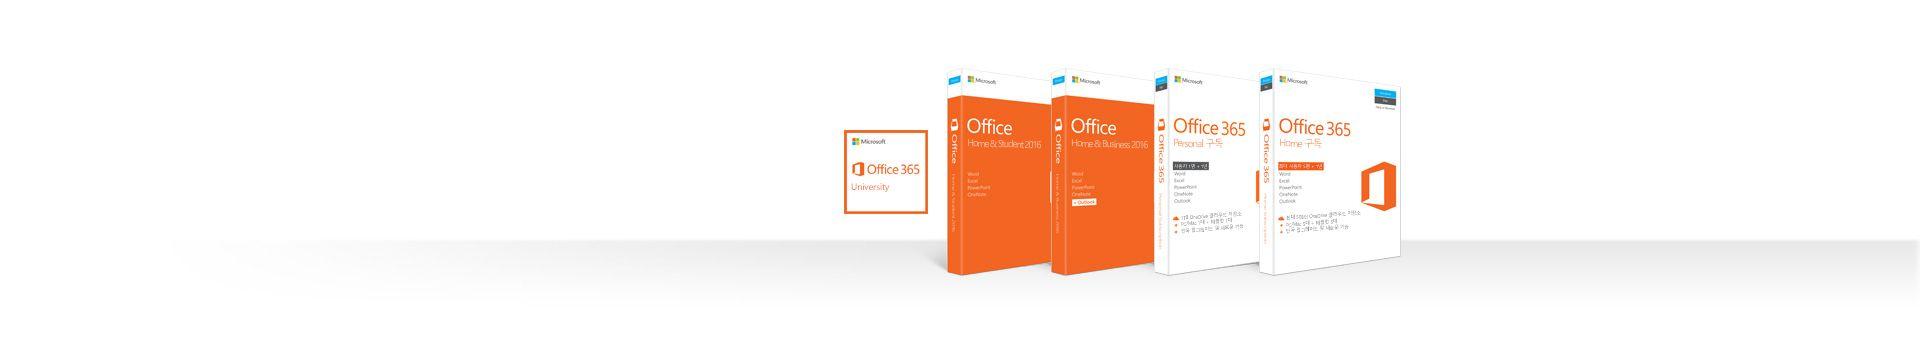 Office 구독과 Mac용 독립 실행형 제품을 나타내는 여러 개의 상자